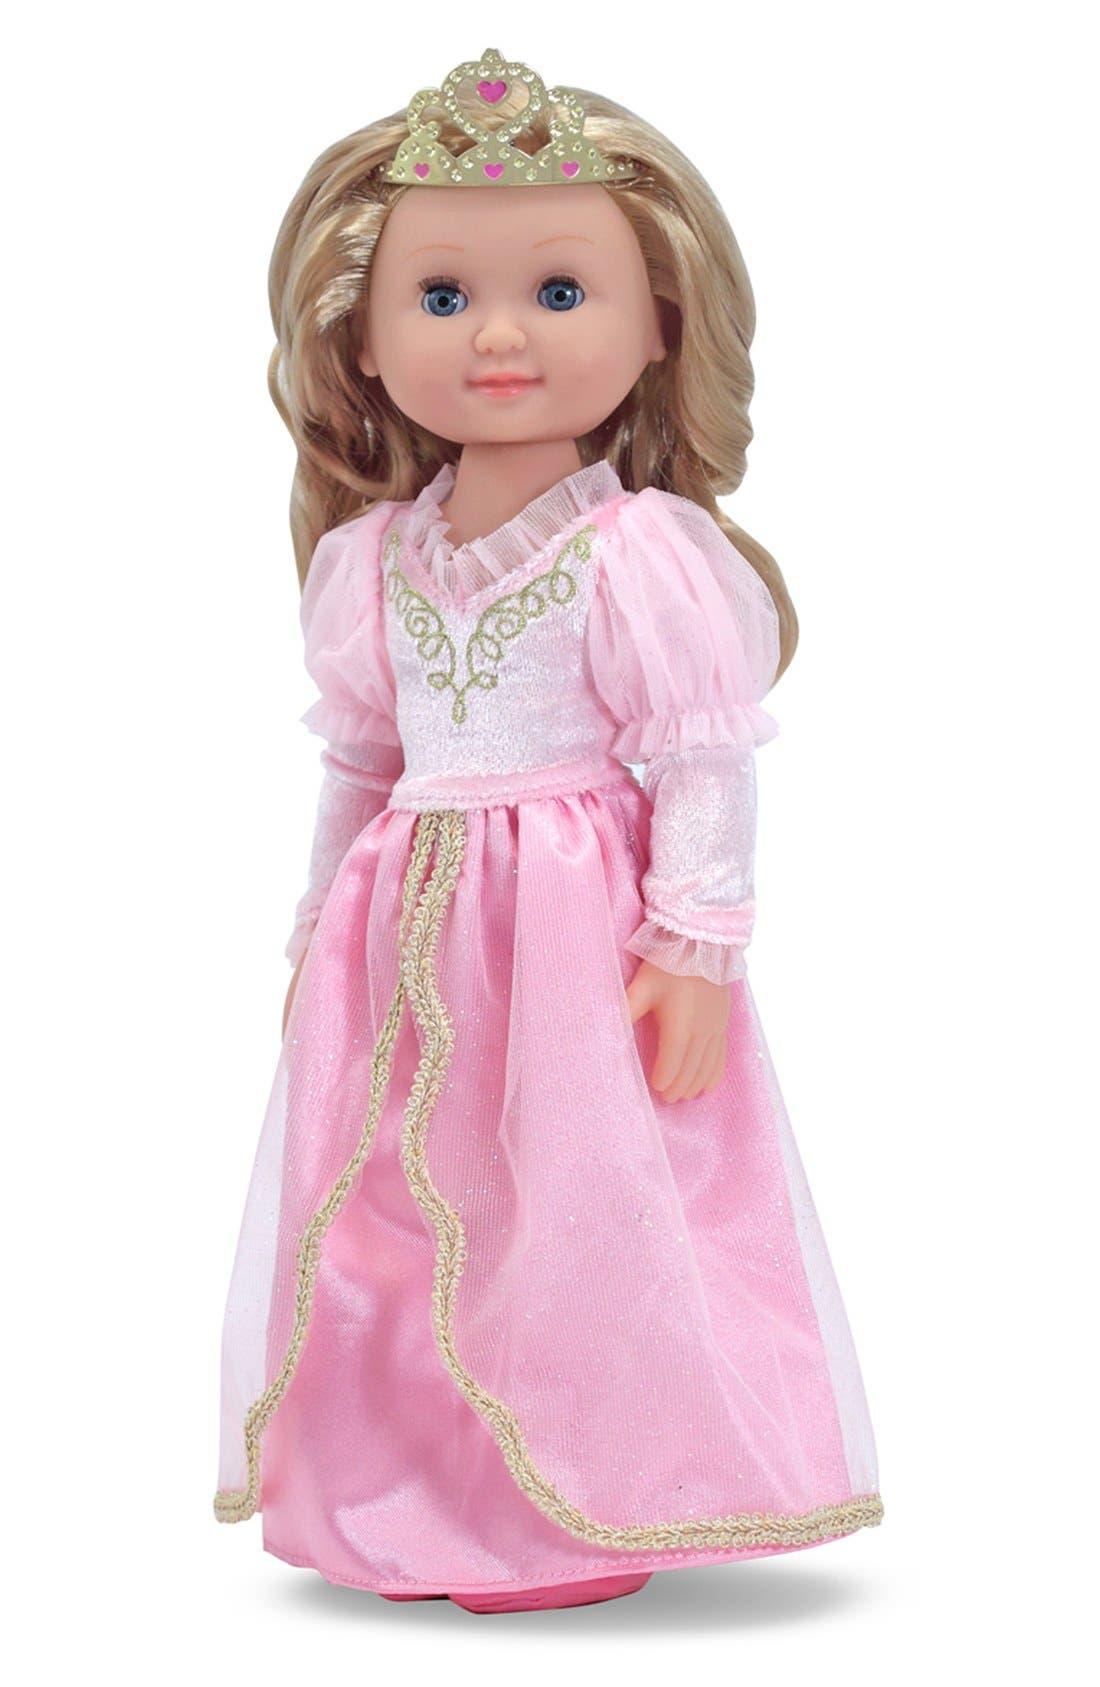 'Mine to Love - Celeste' Princess Doll,                             Main thumbnail 1, color,                             PINK